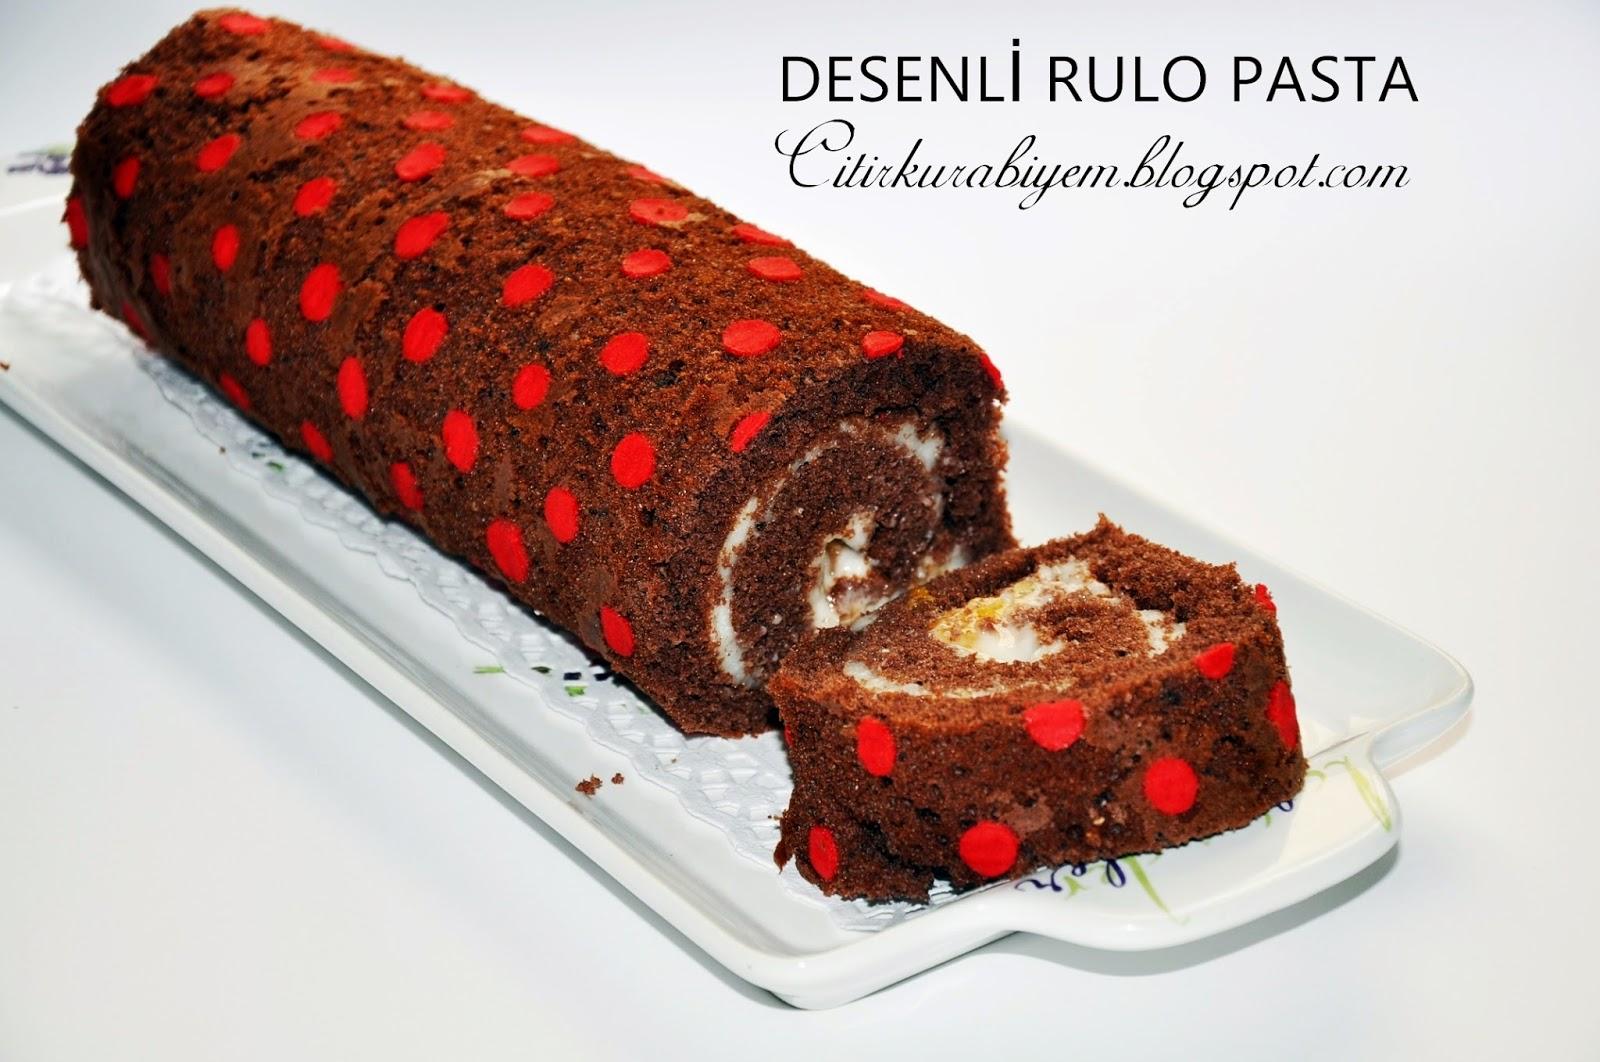 Desenli Rulo Pasta Tarifi Denenmiş Tarifi